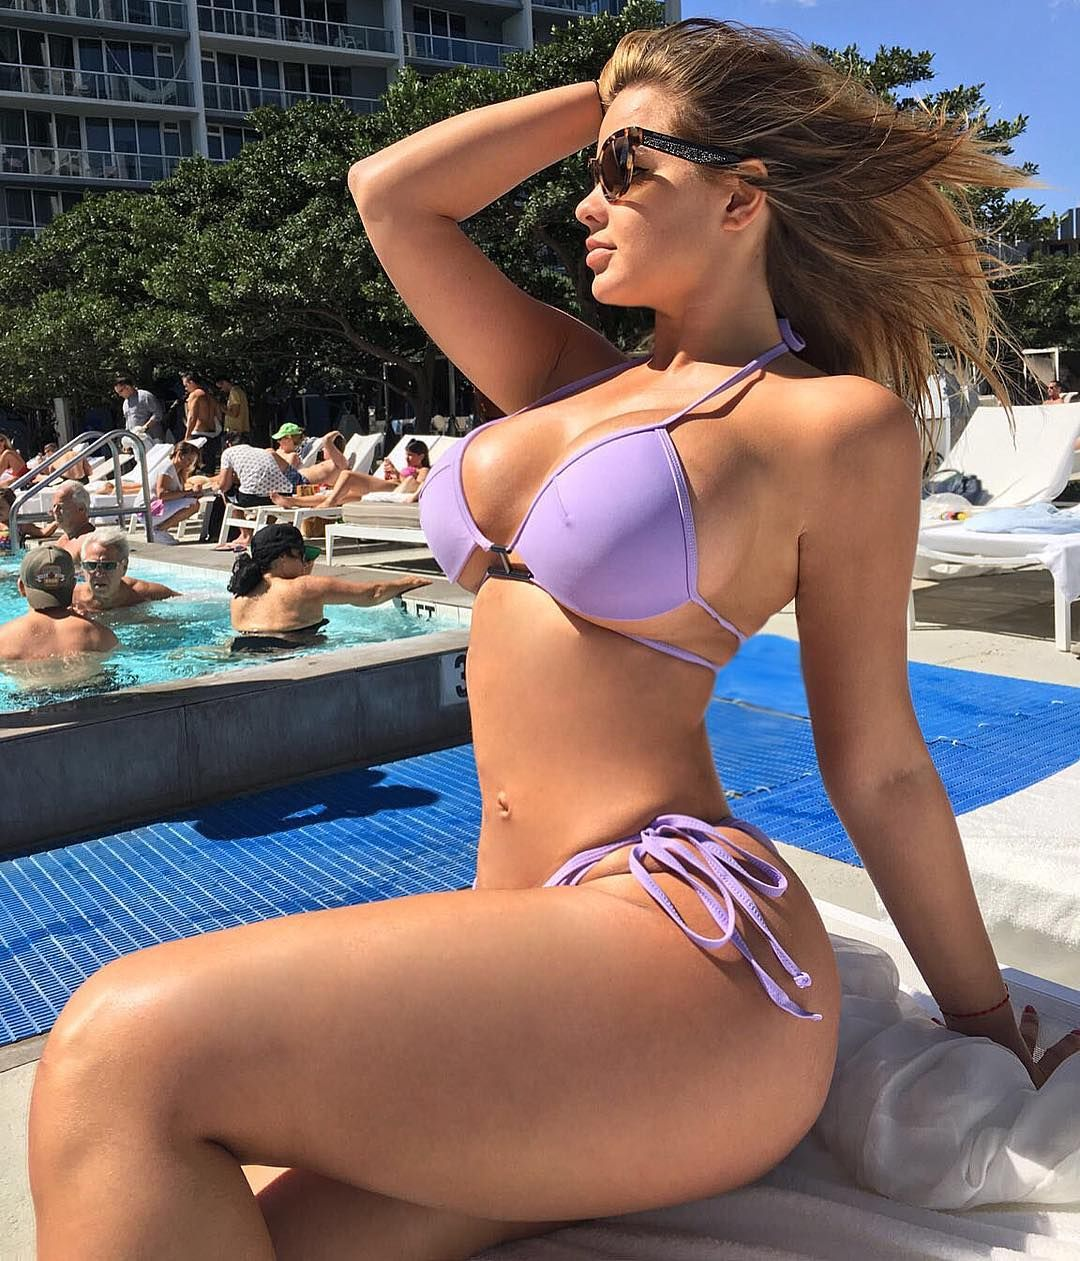 Big tits in a hot tub